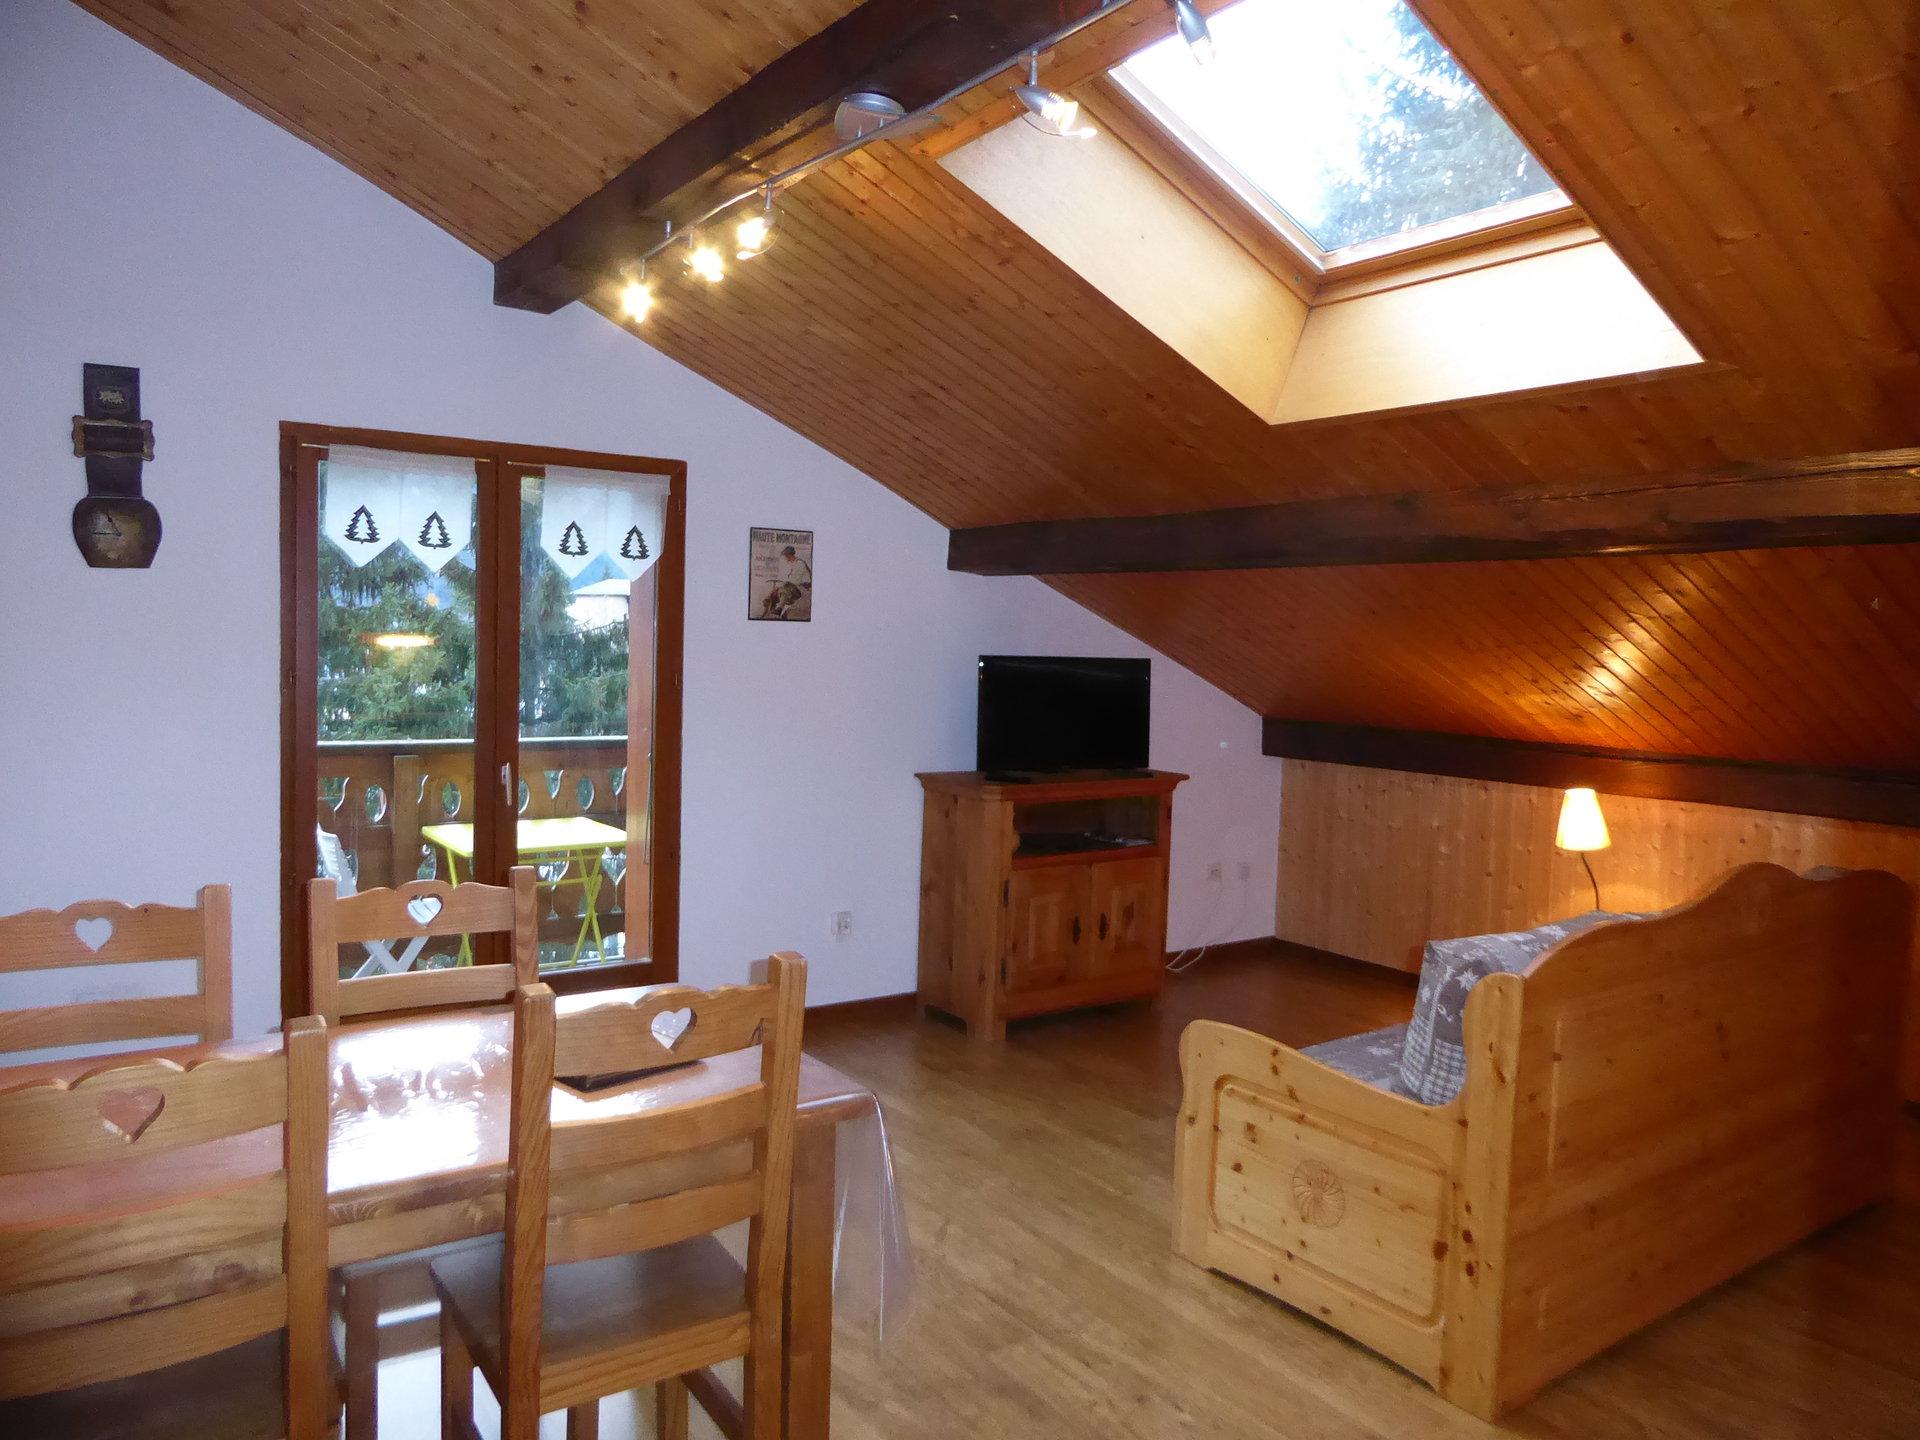 Rental reference : ESTELANN2 to Champagny en Vanoise